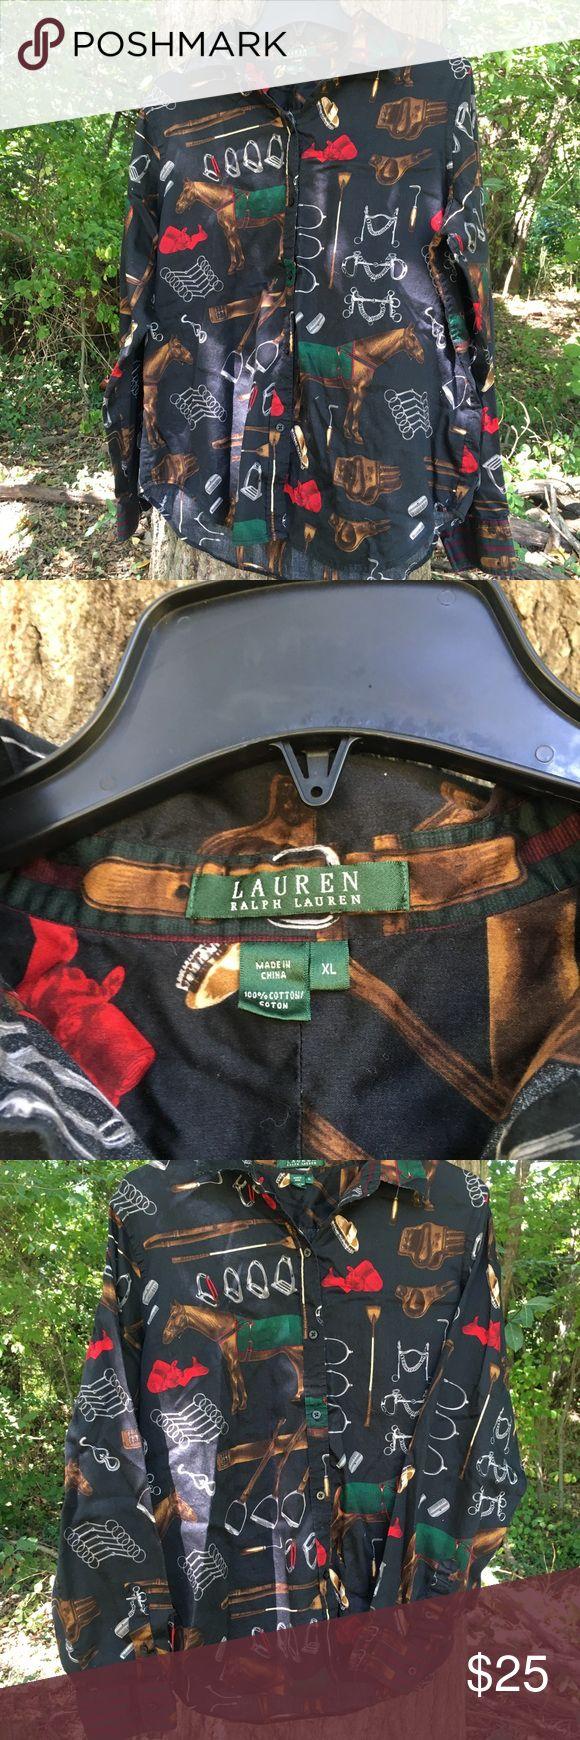 "Lauren Ralph Lauren Women's Equestrian Horse Lauren Ralph Lauren Women's Equestrian Horse Print Button size XL.   23"" armpit to armpit 26"" length 29""x19"" arms Ralph Lauren Tops Button Down Shirts"